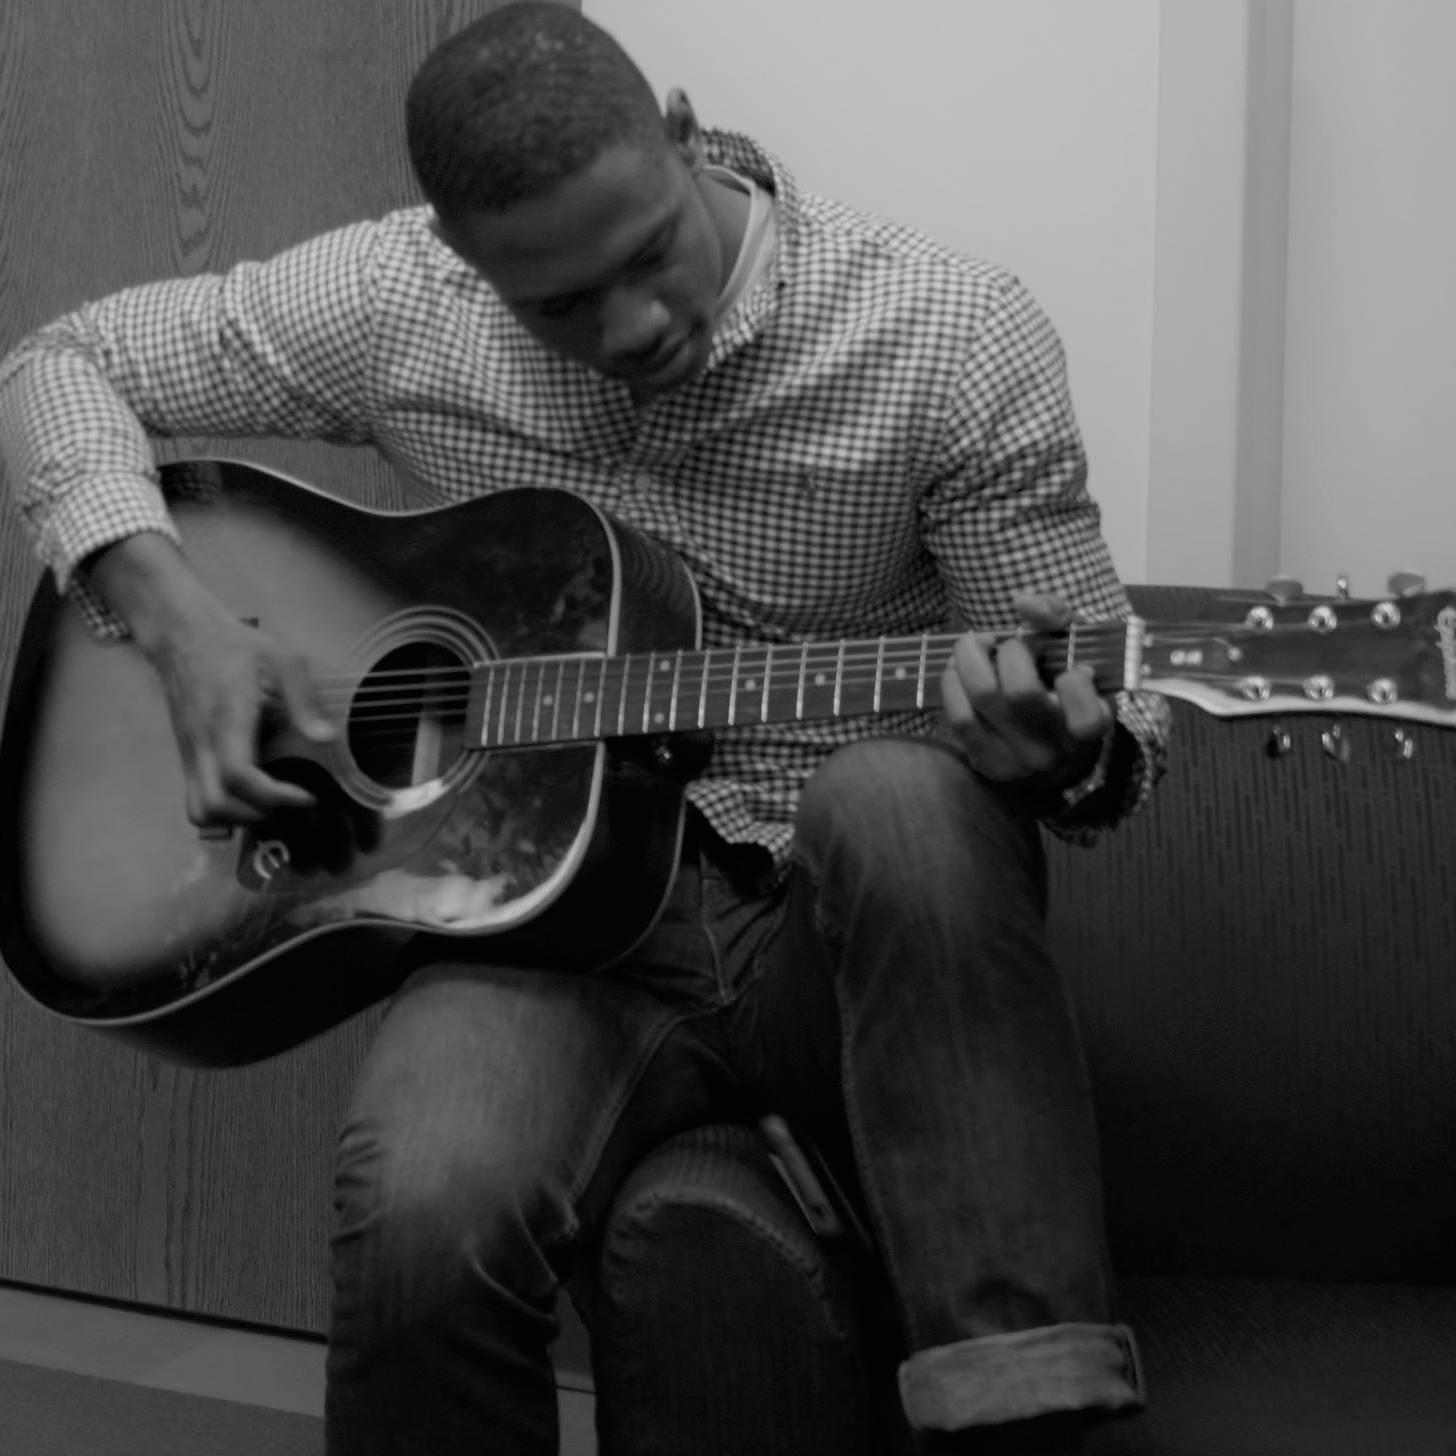 20170308 Ramarro - Guitar